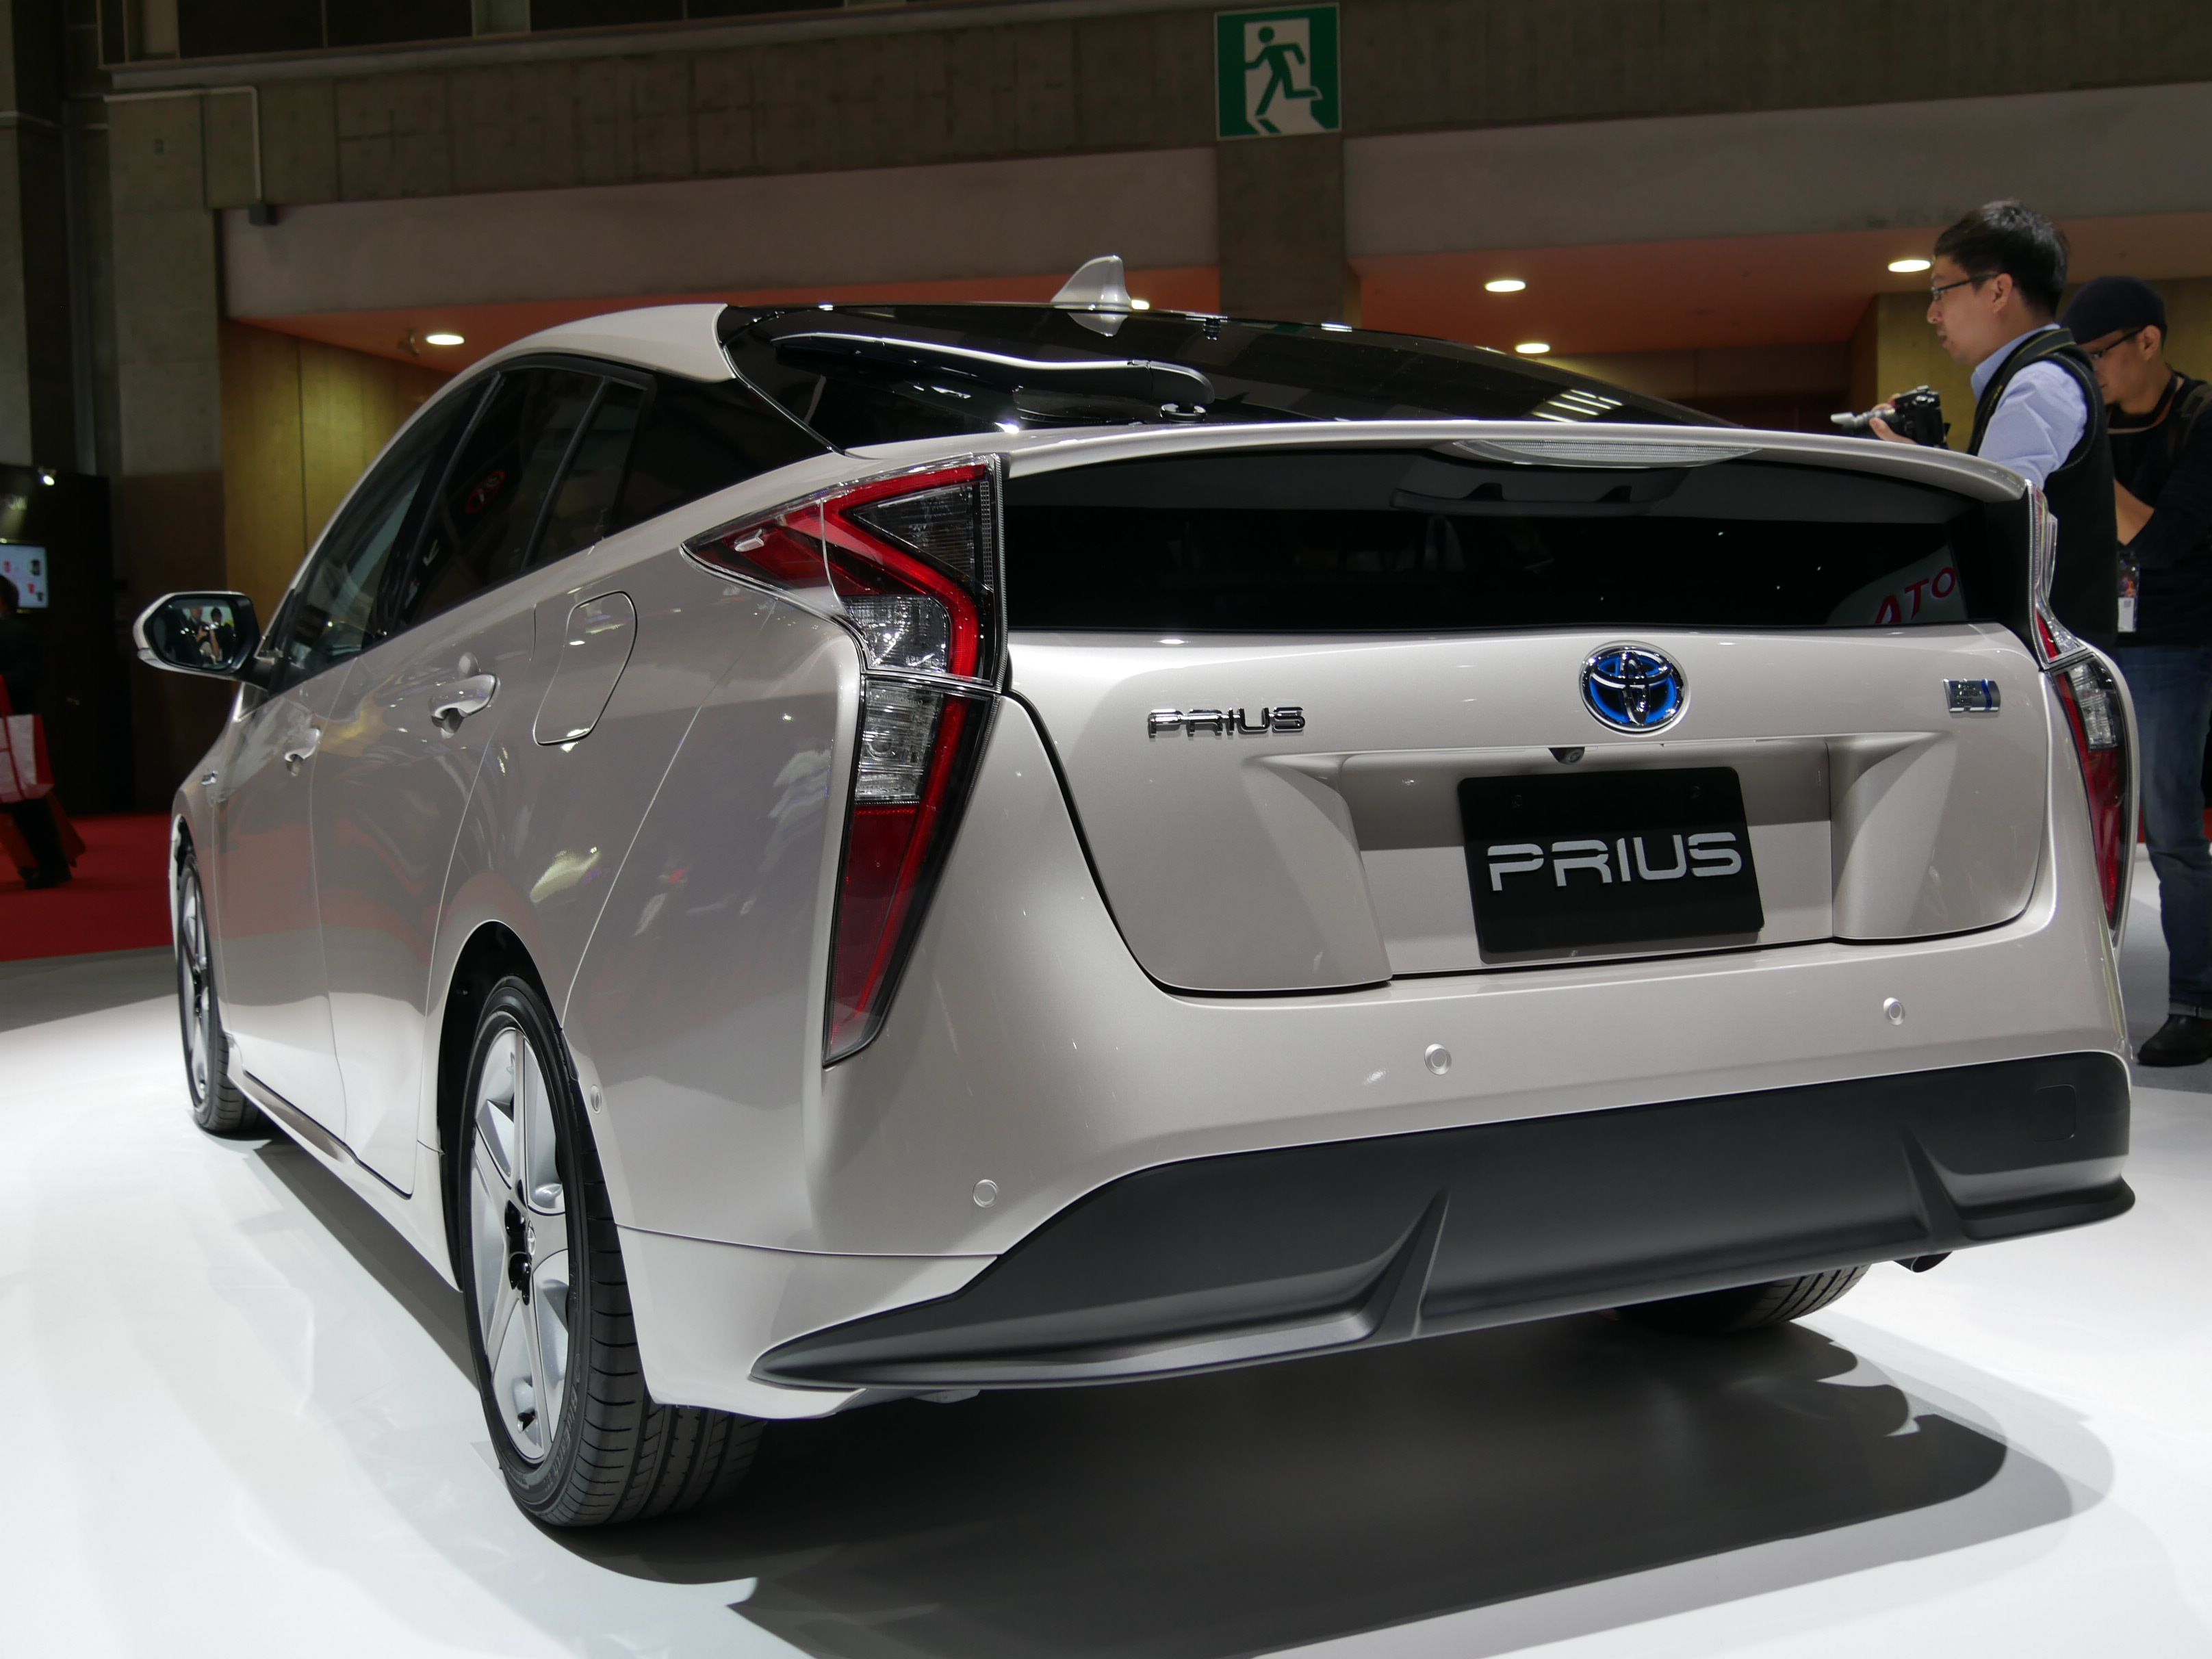 Toyota Prius 4 2016 en direct du salon automobile de Tokyo